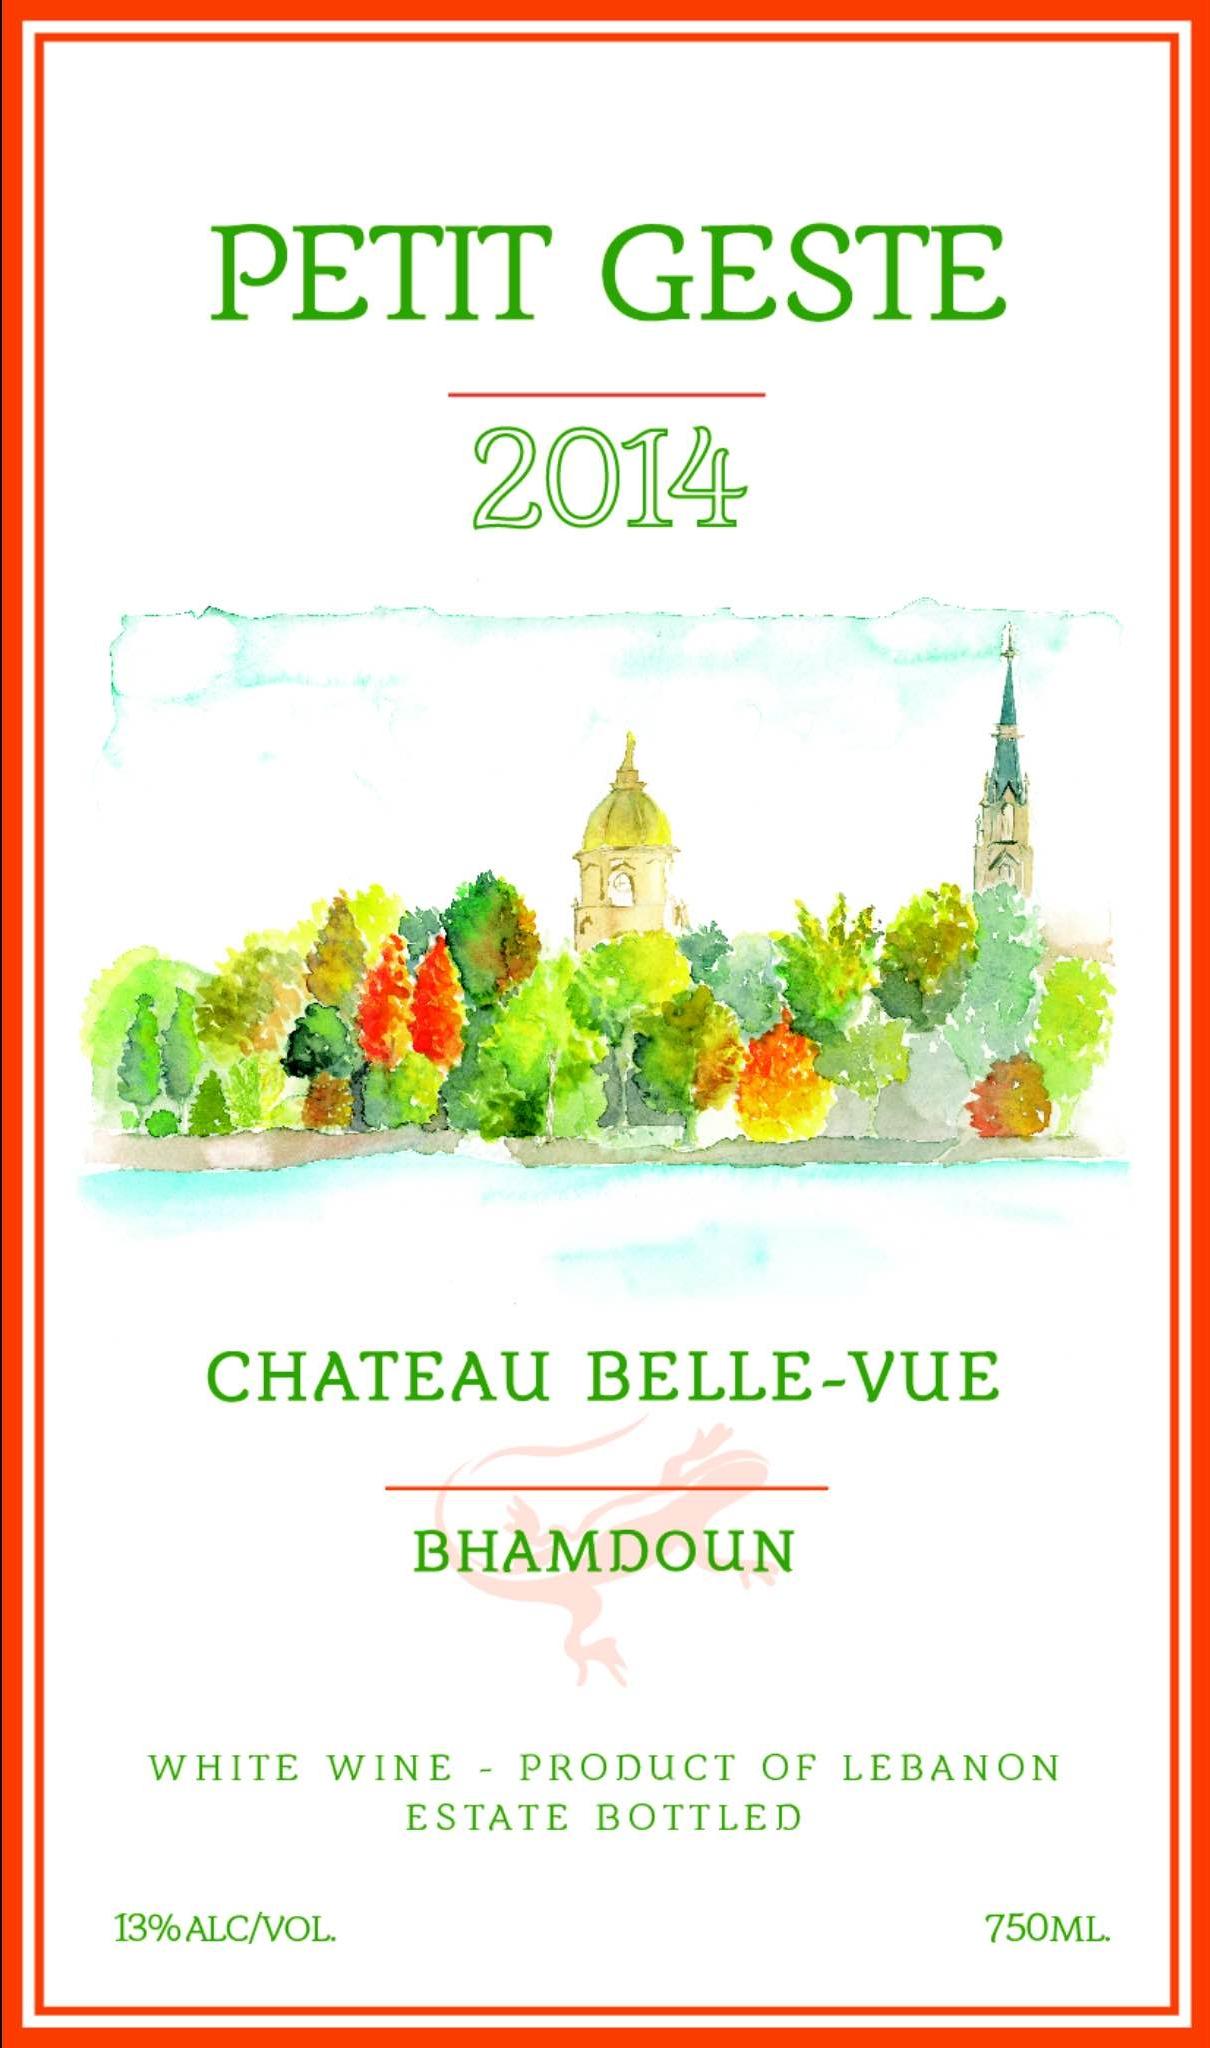 Petit Geste 2014 label.jpg